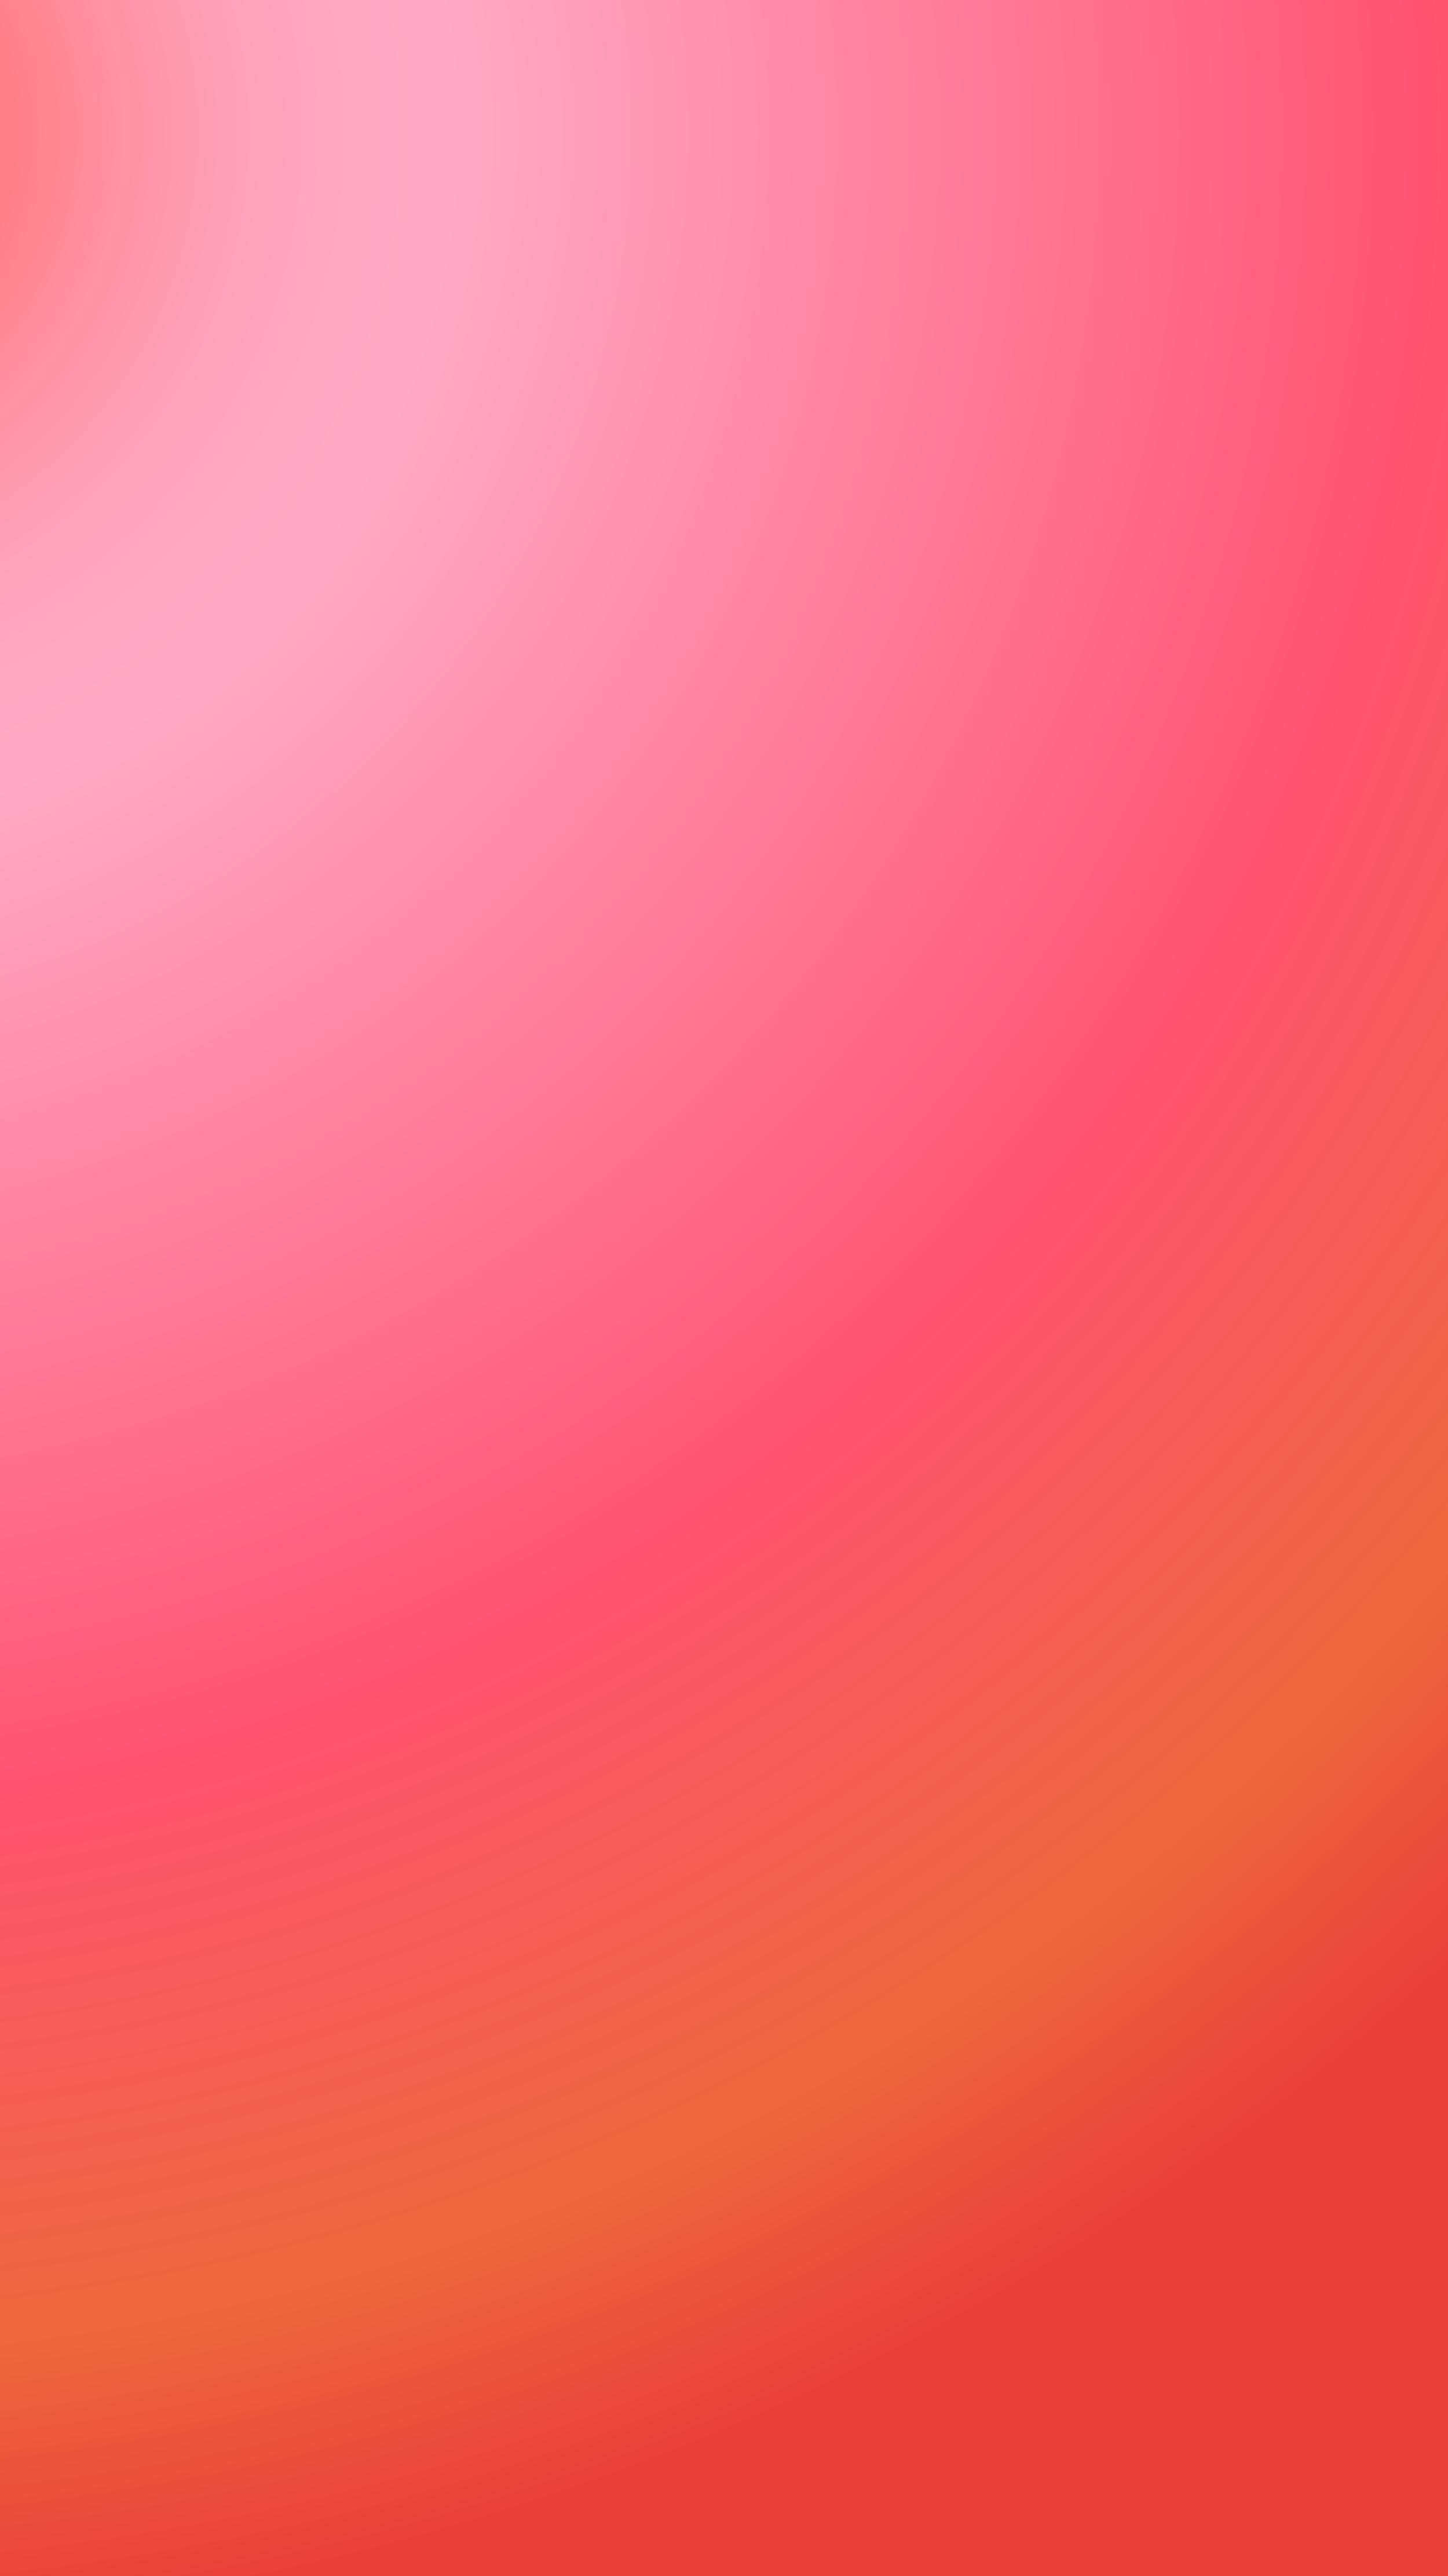 pink gradient.png